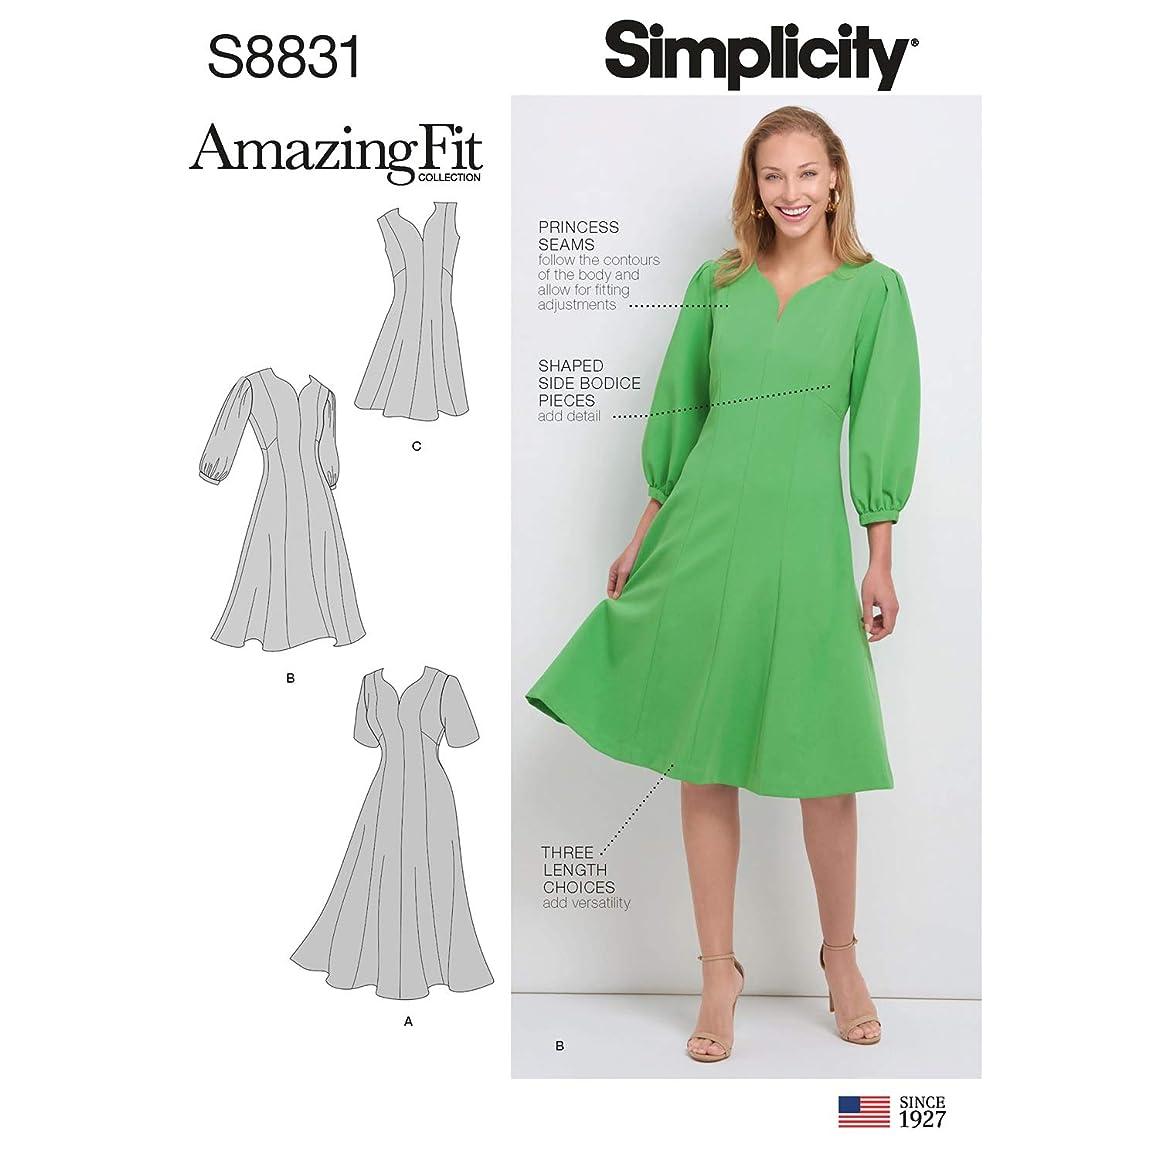 Simplicity US8831AA Pattern S8831 Misses'/Women's Amazing Fit Dress, AA (10-12-14-16-18)